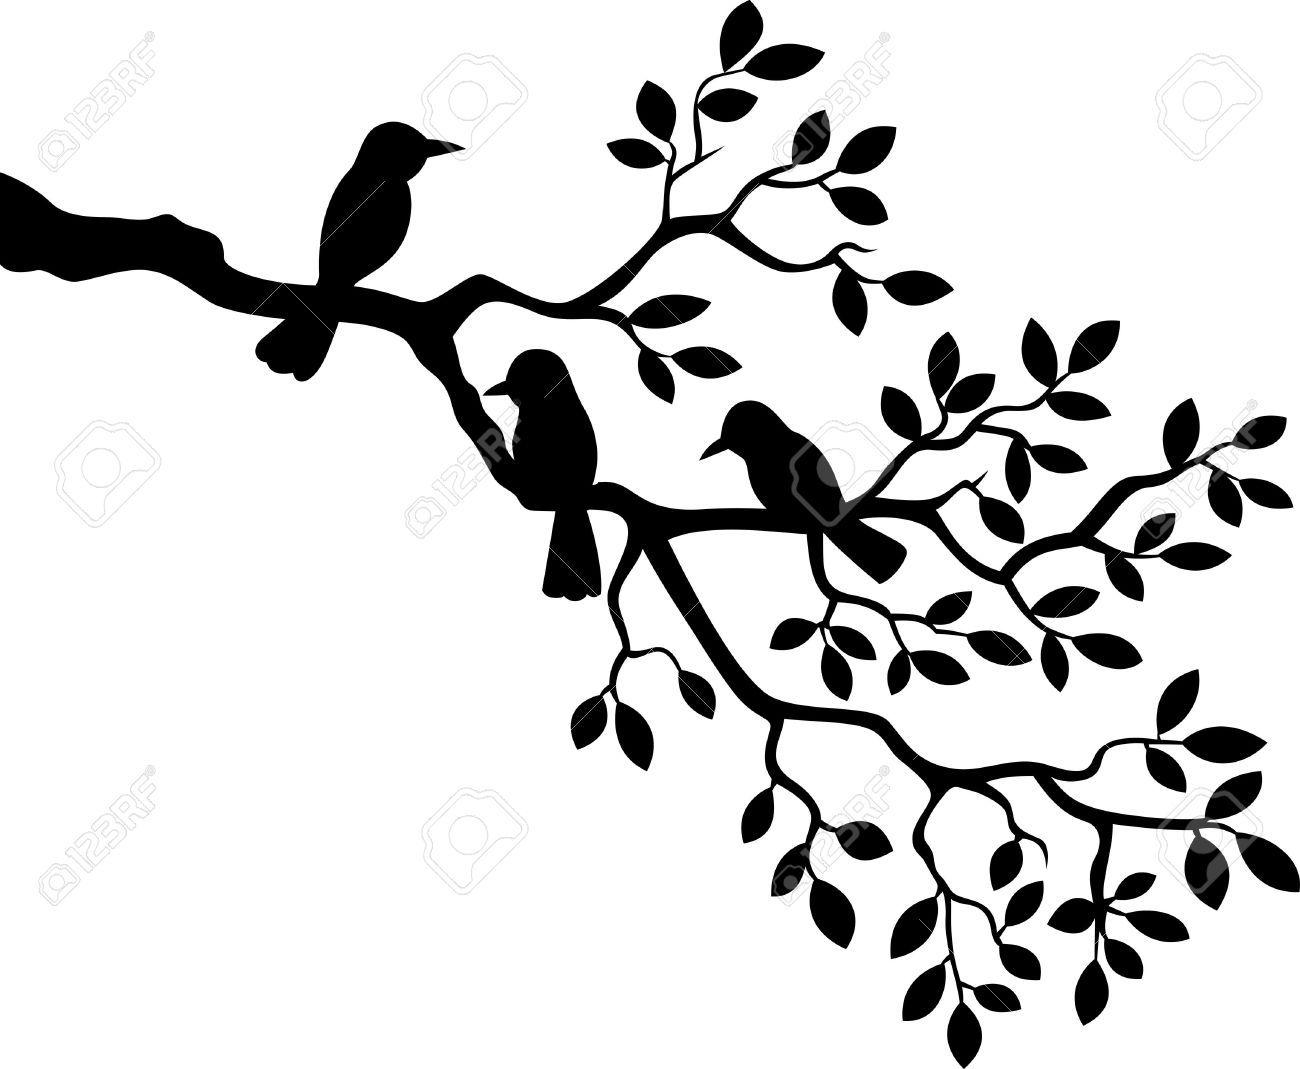 Rama De Un árbol De La Historieta Con La Silueta De Aves